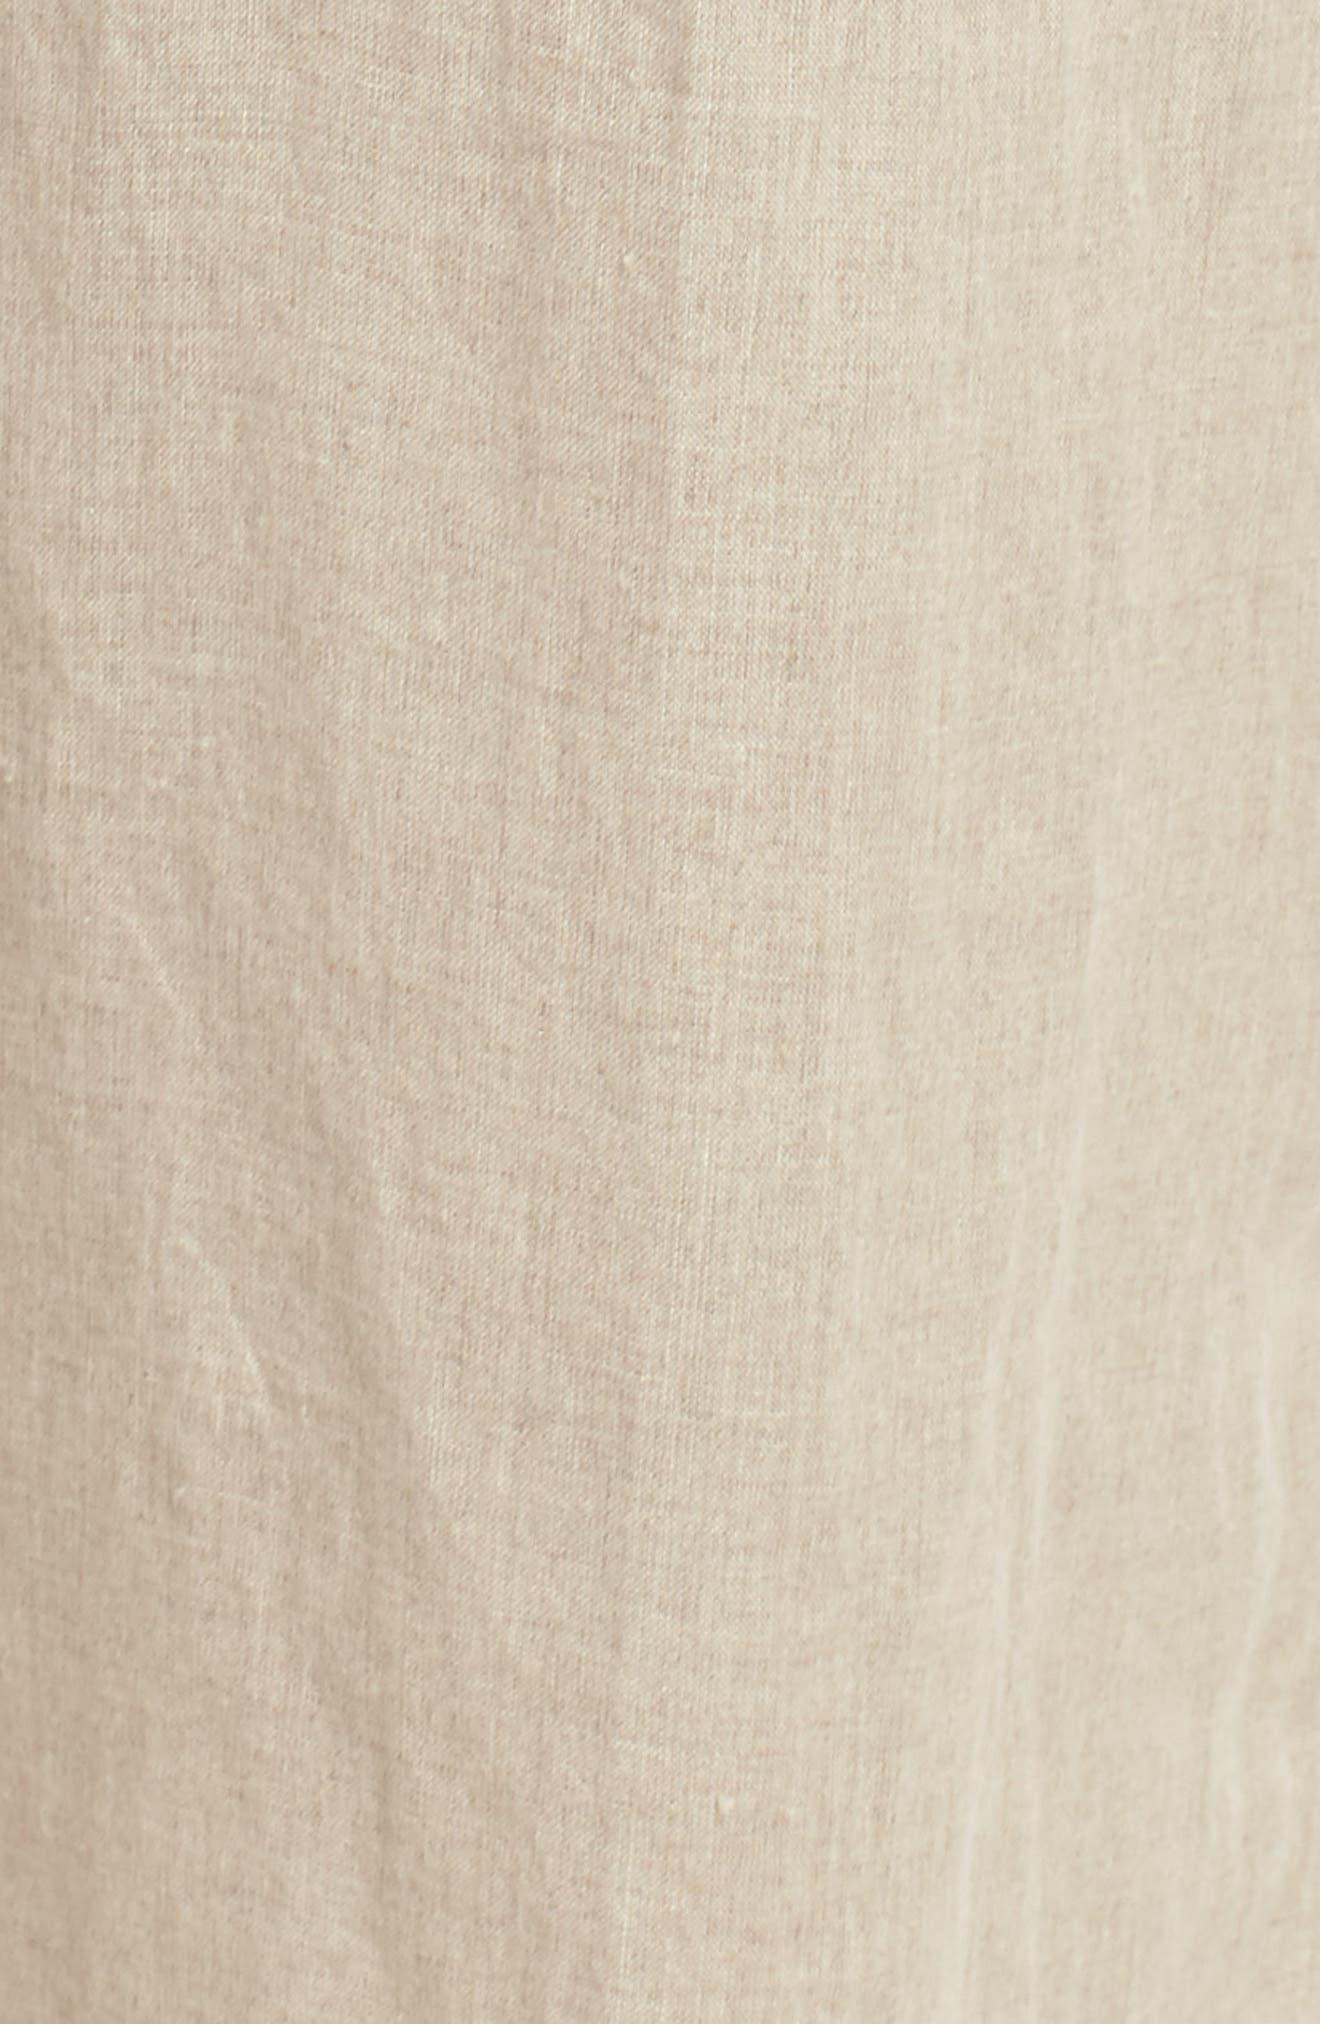 Organic Linen Ankle Pants,                             Alternate thumbnail 6, color,                             Undyed Natural